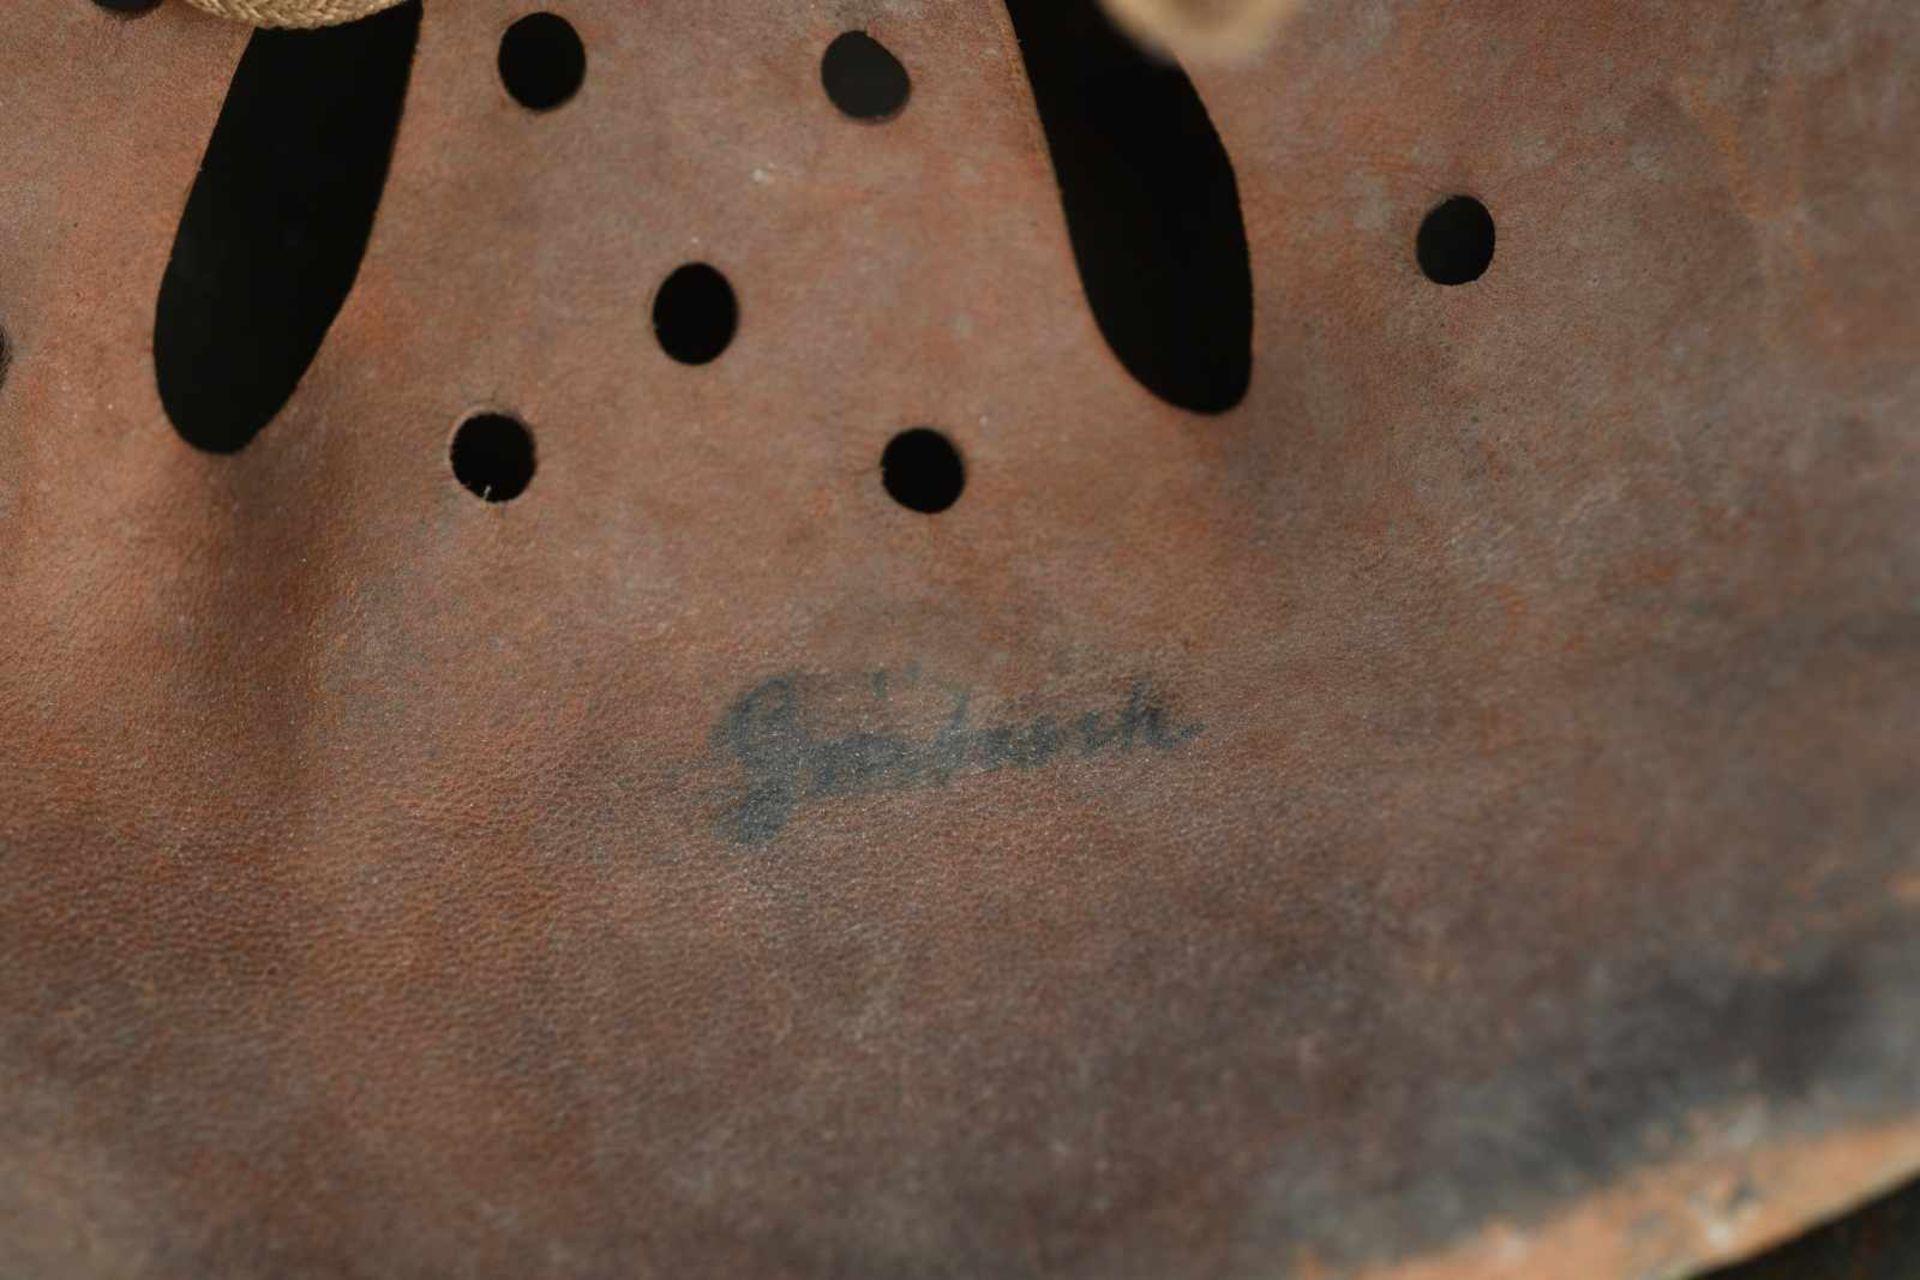 Casque nominatif de la Heer. Coque de casque 40, fabrication «Q62», numéro de lot illisible. - Bild 2 aus 4